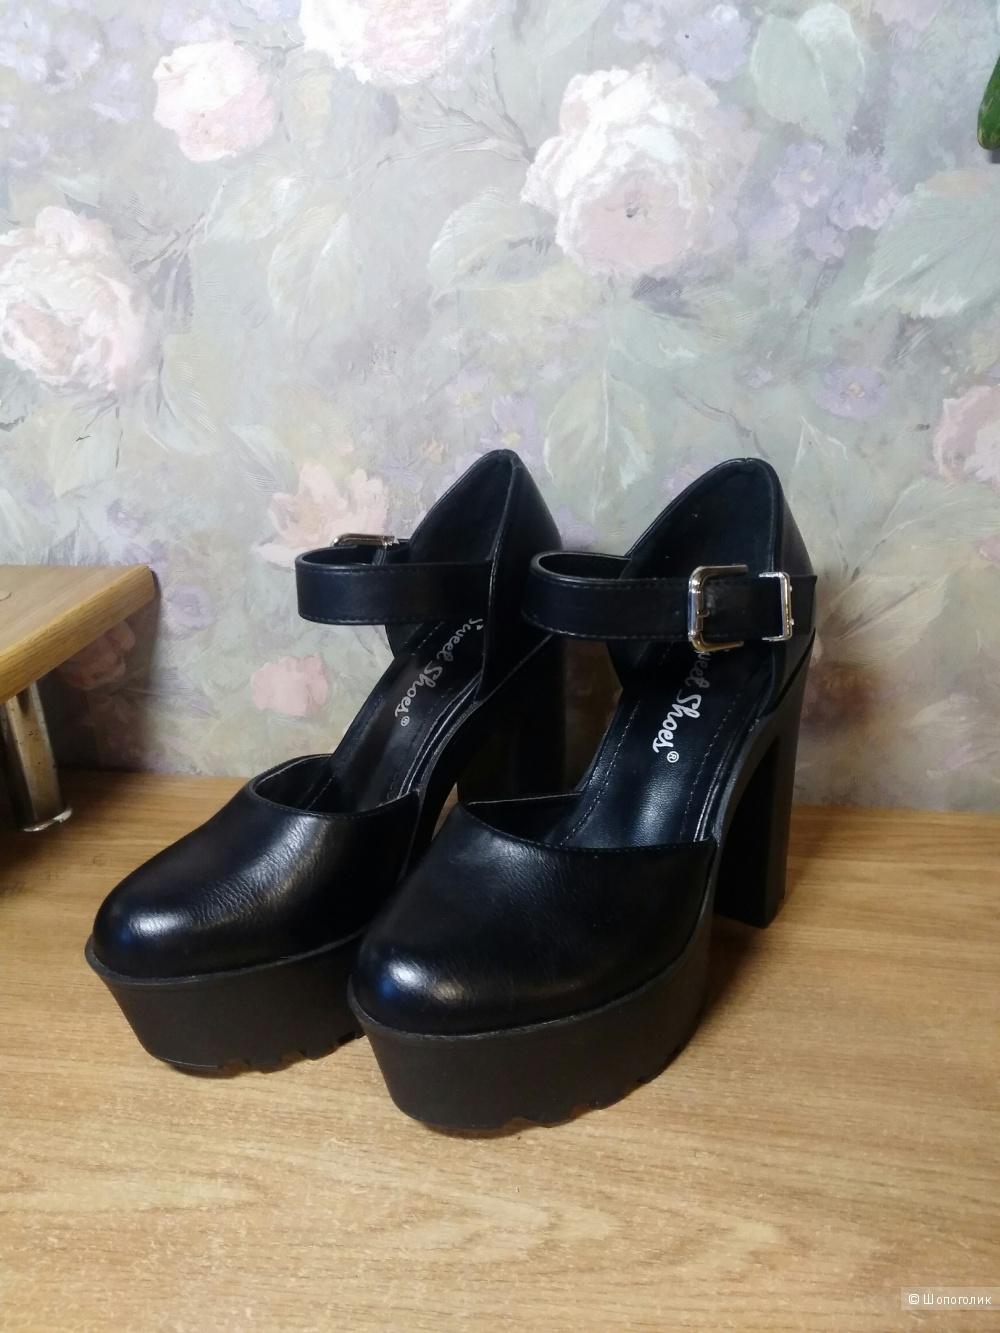 Босоножки Sweet Shoes 36 размера.